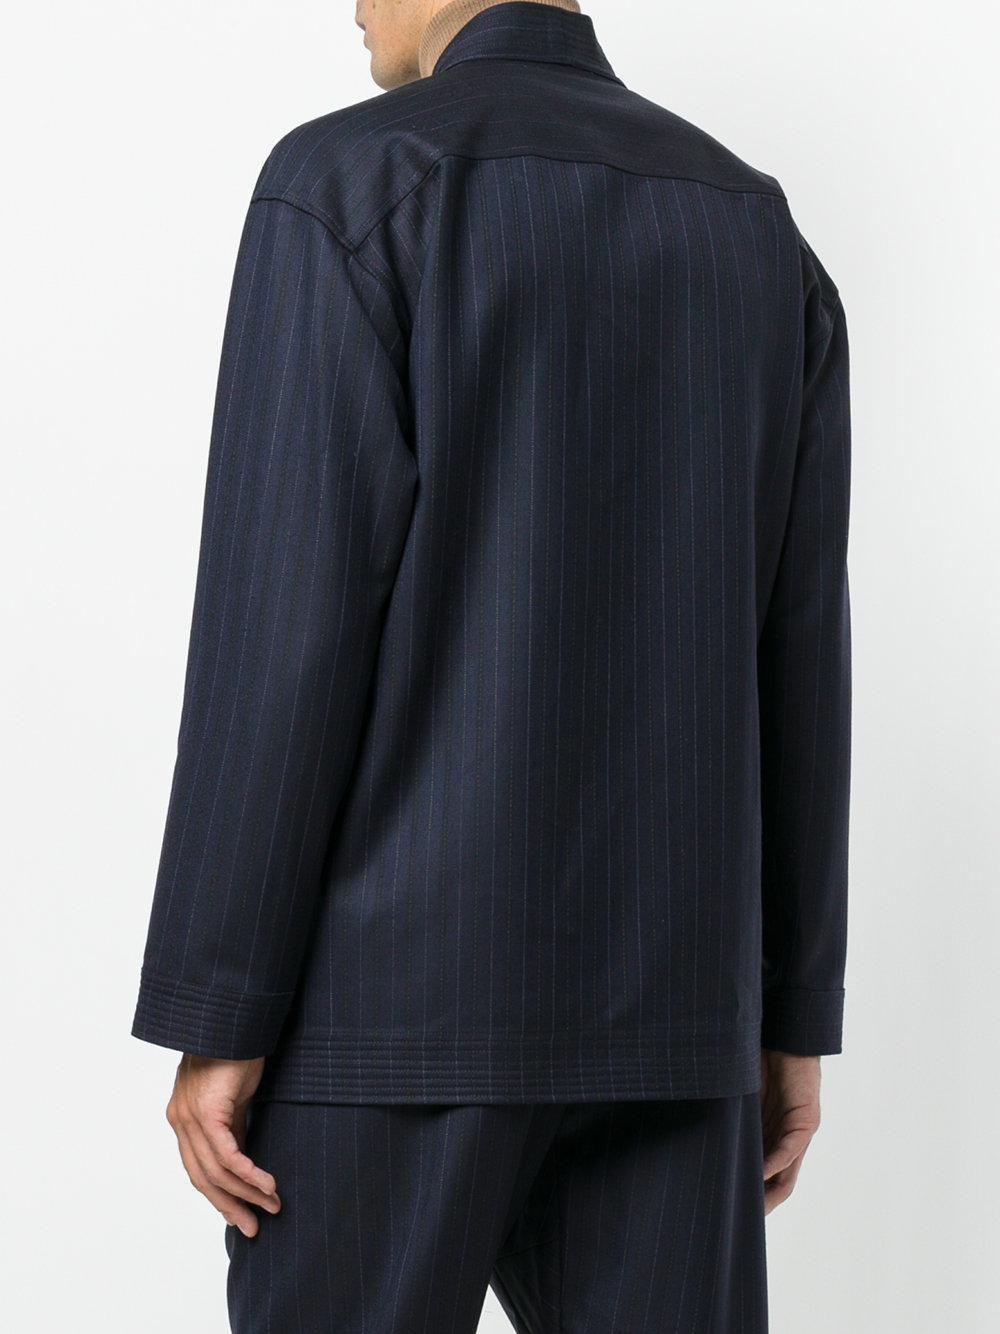 Umit Benan Wool Pinstripe Kimono Style Jacket in Blue for Men